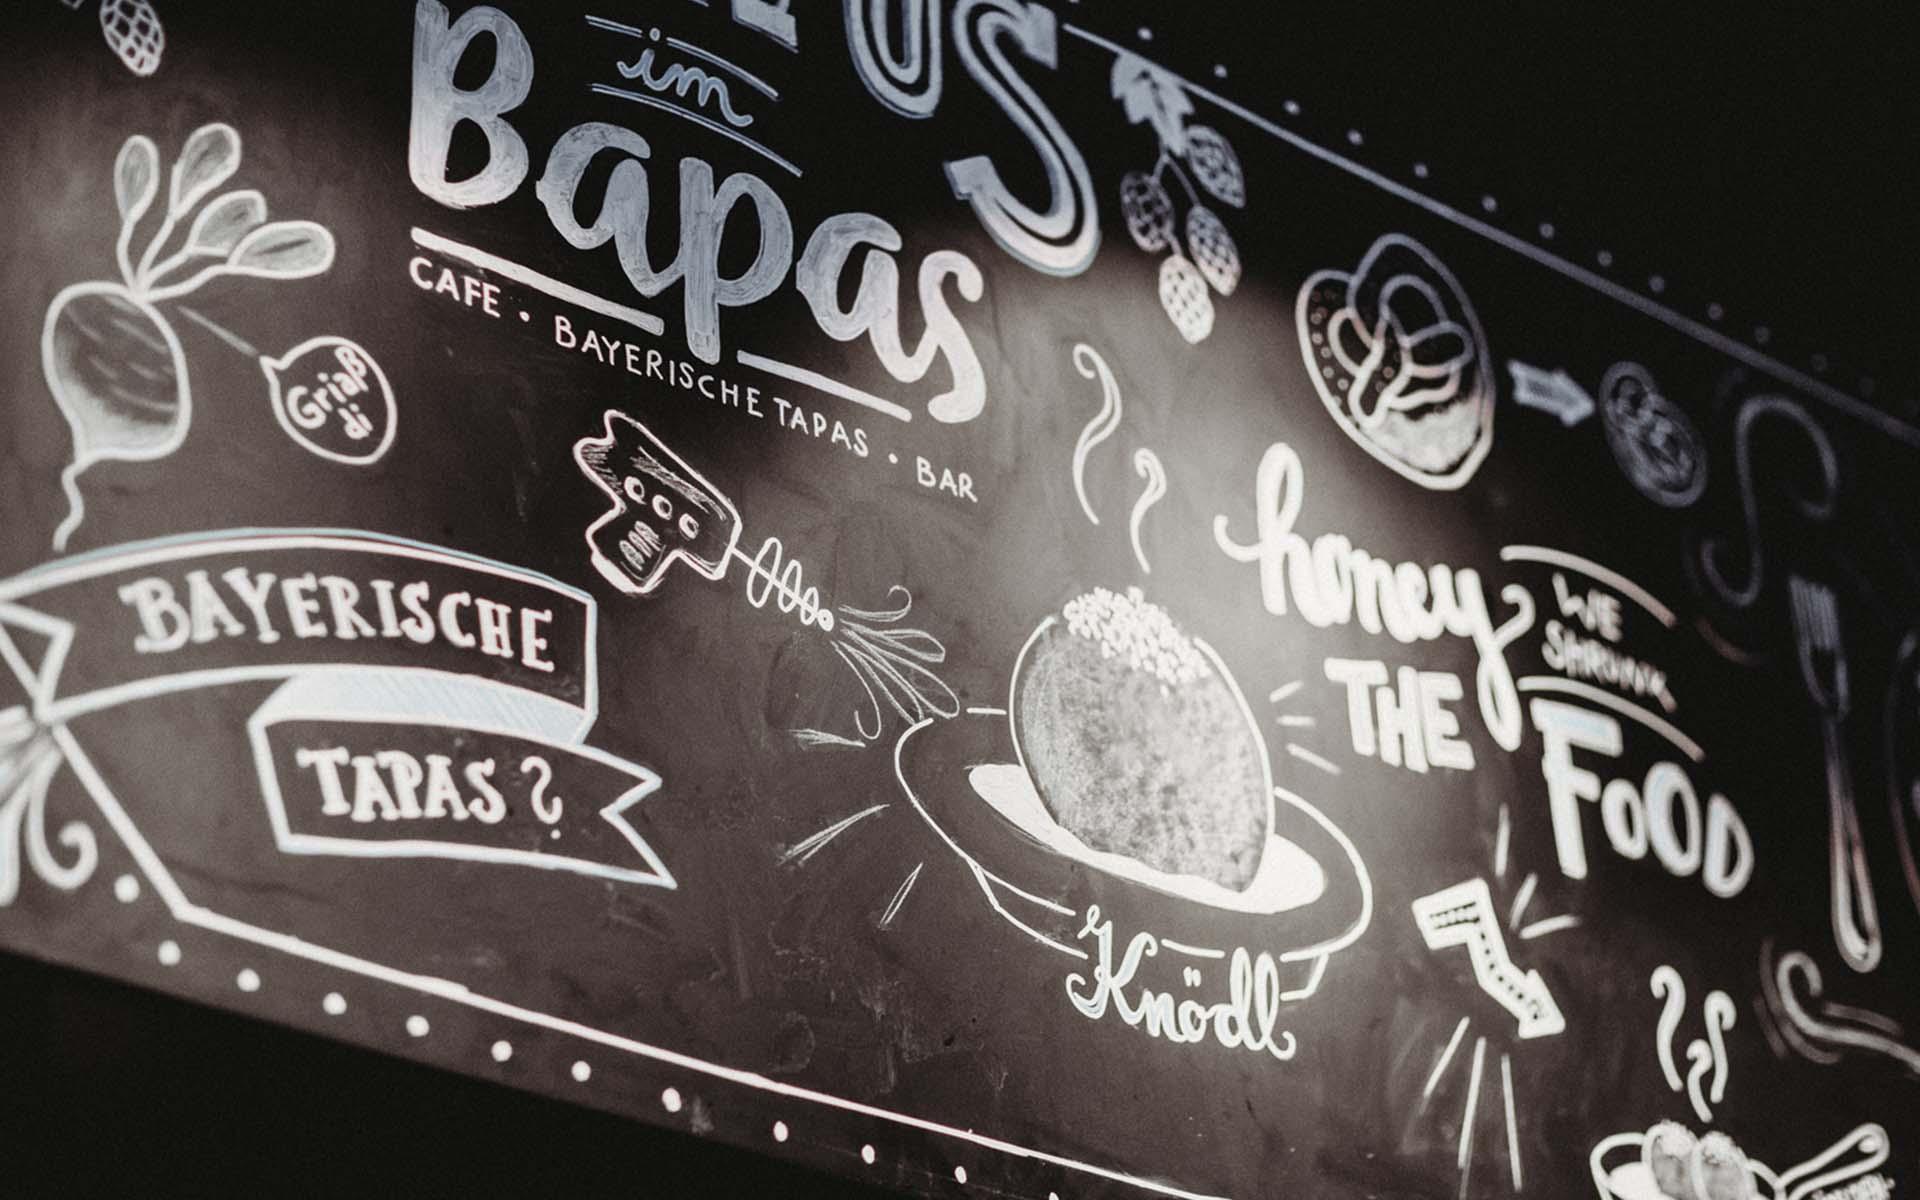 Bapas - Bayerische Tapas - Bar - Cafe - München Schwabing